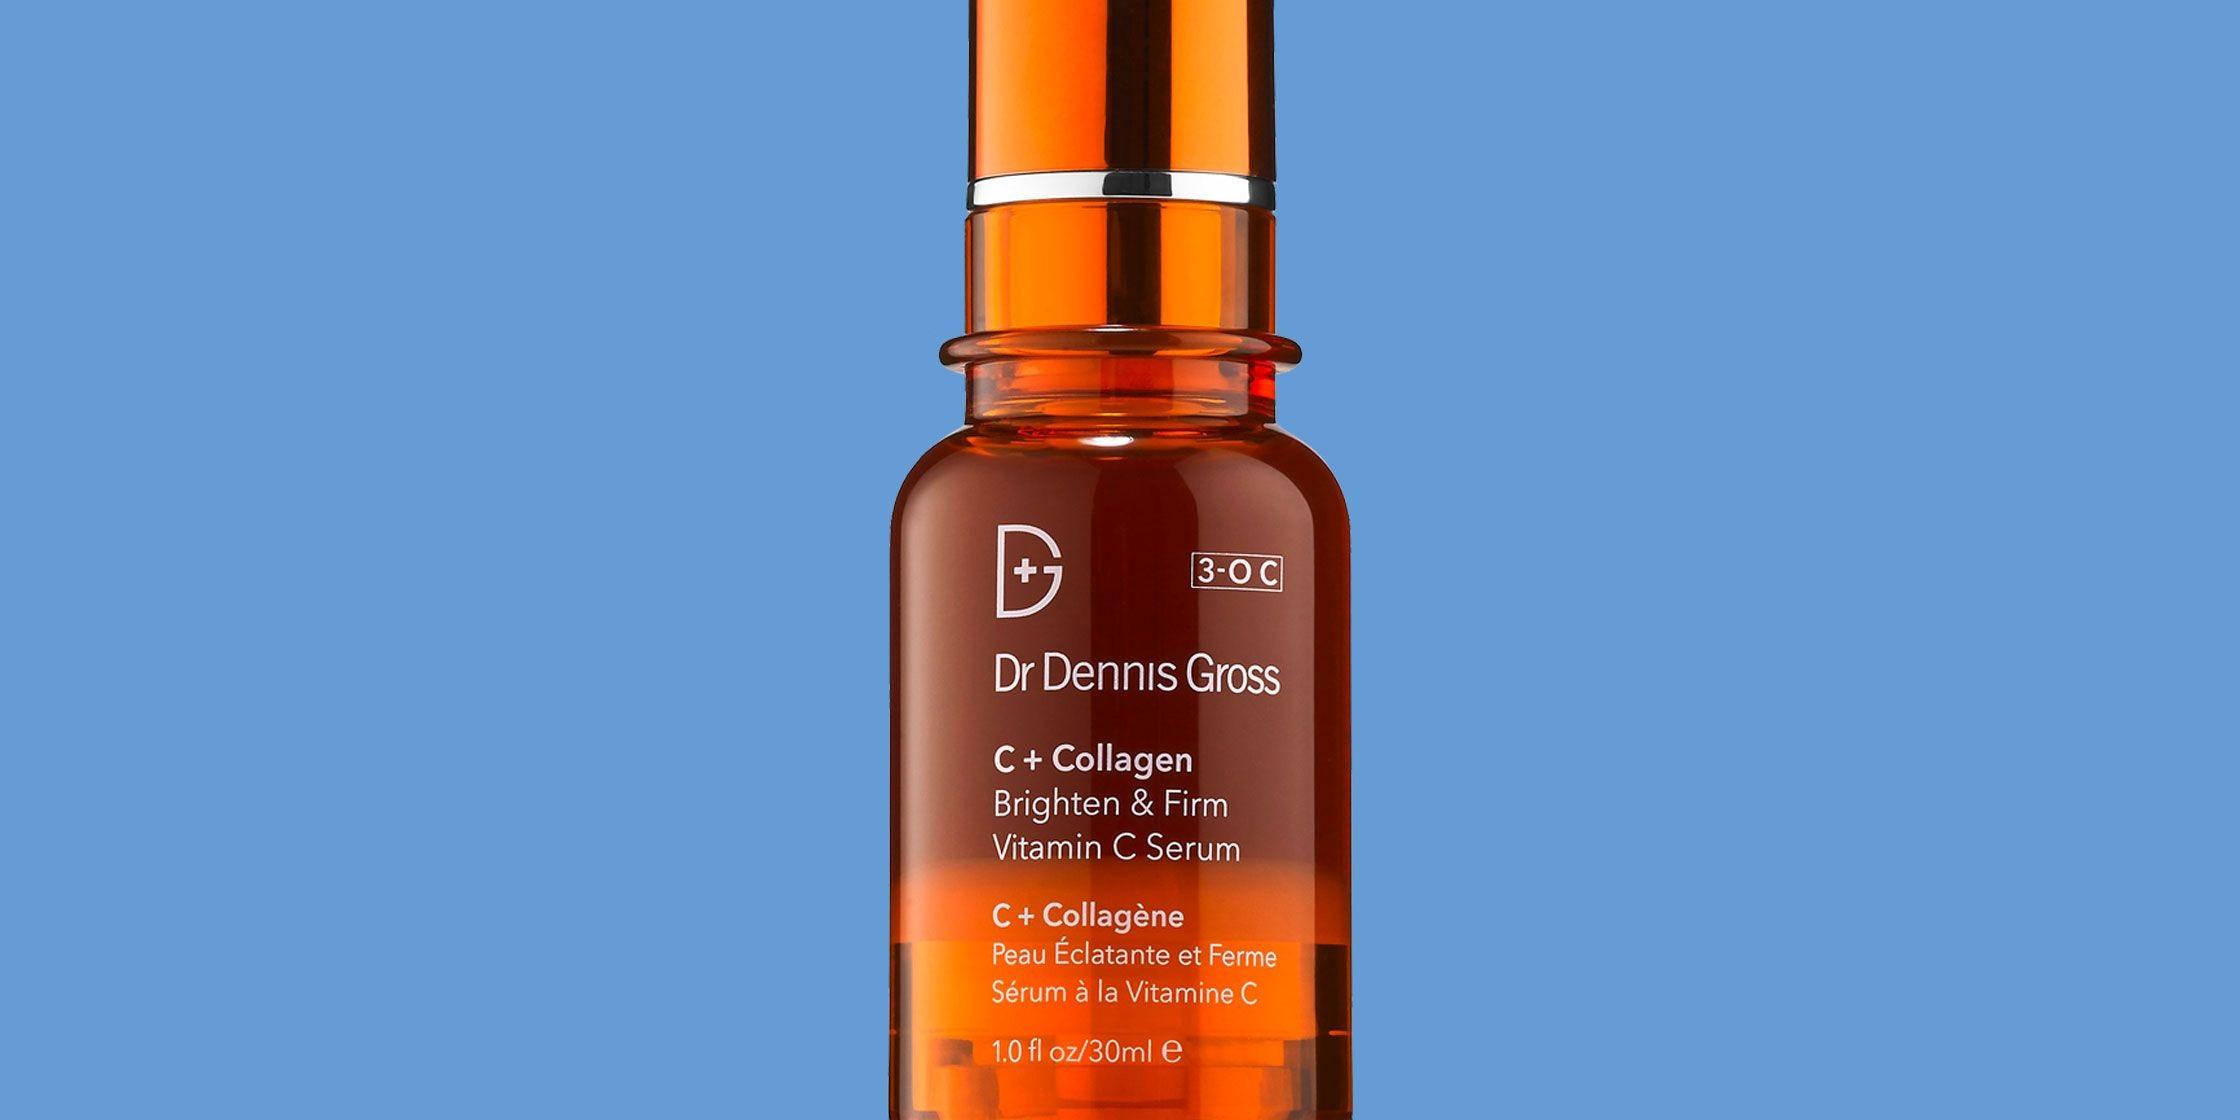 Dr. Dennis Gross Skincare C+ Vitamin C Serum is a Skin Protector